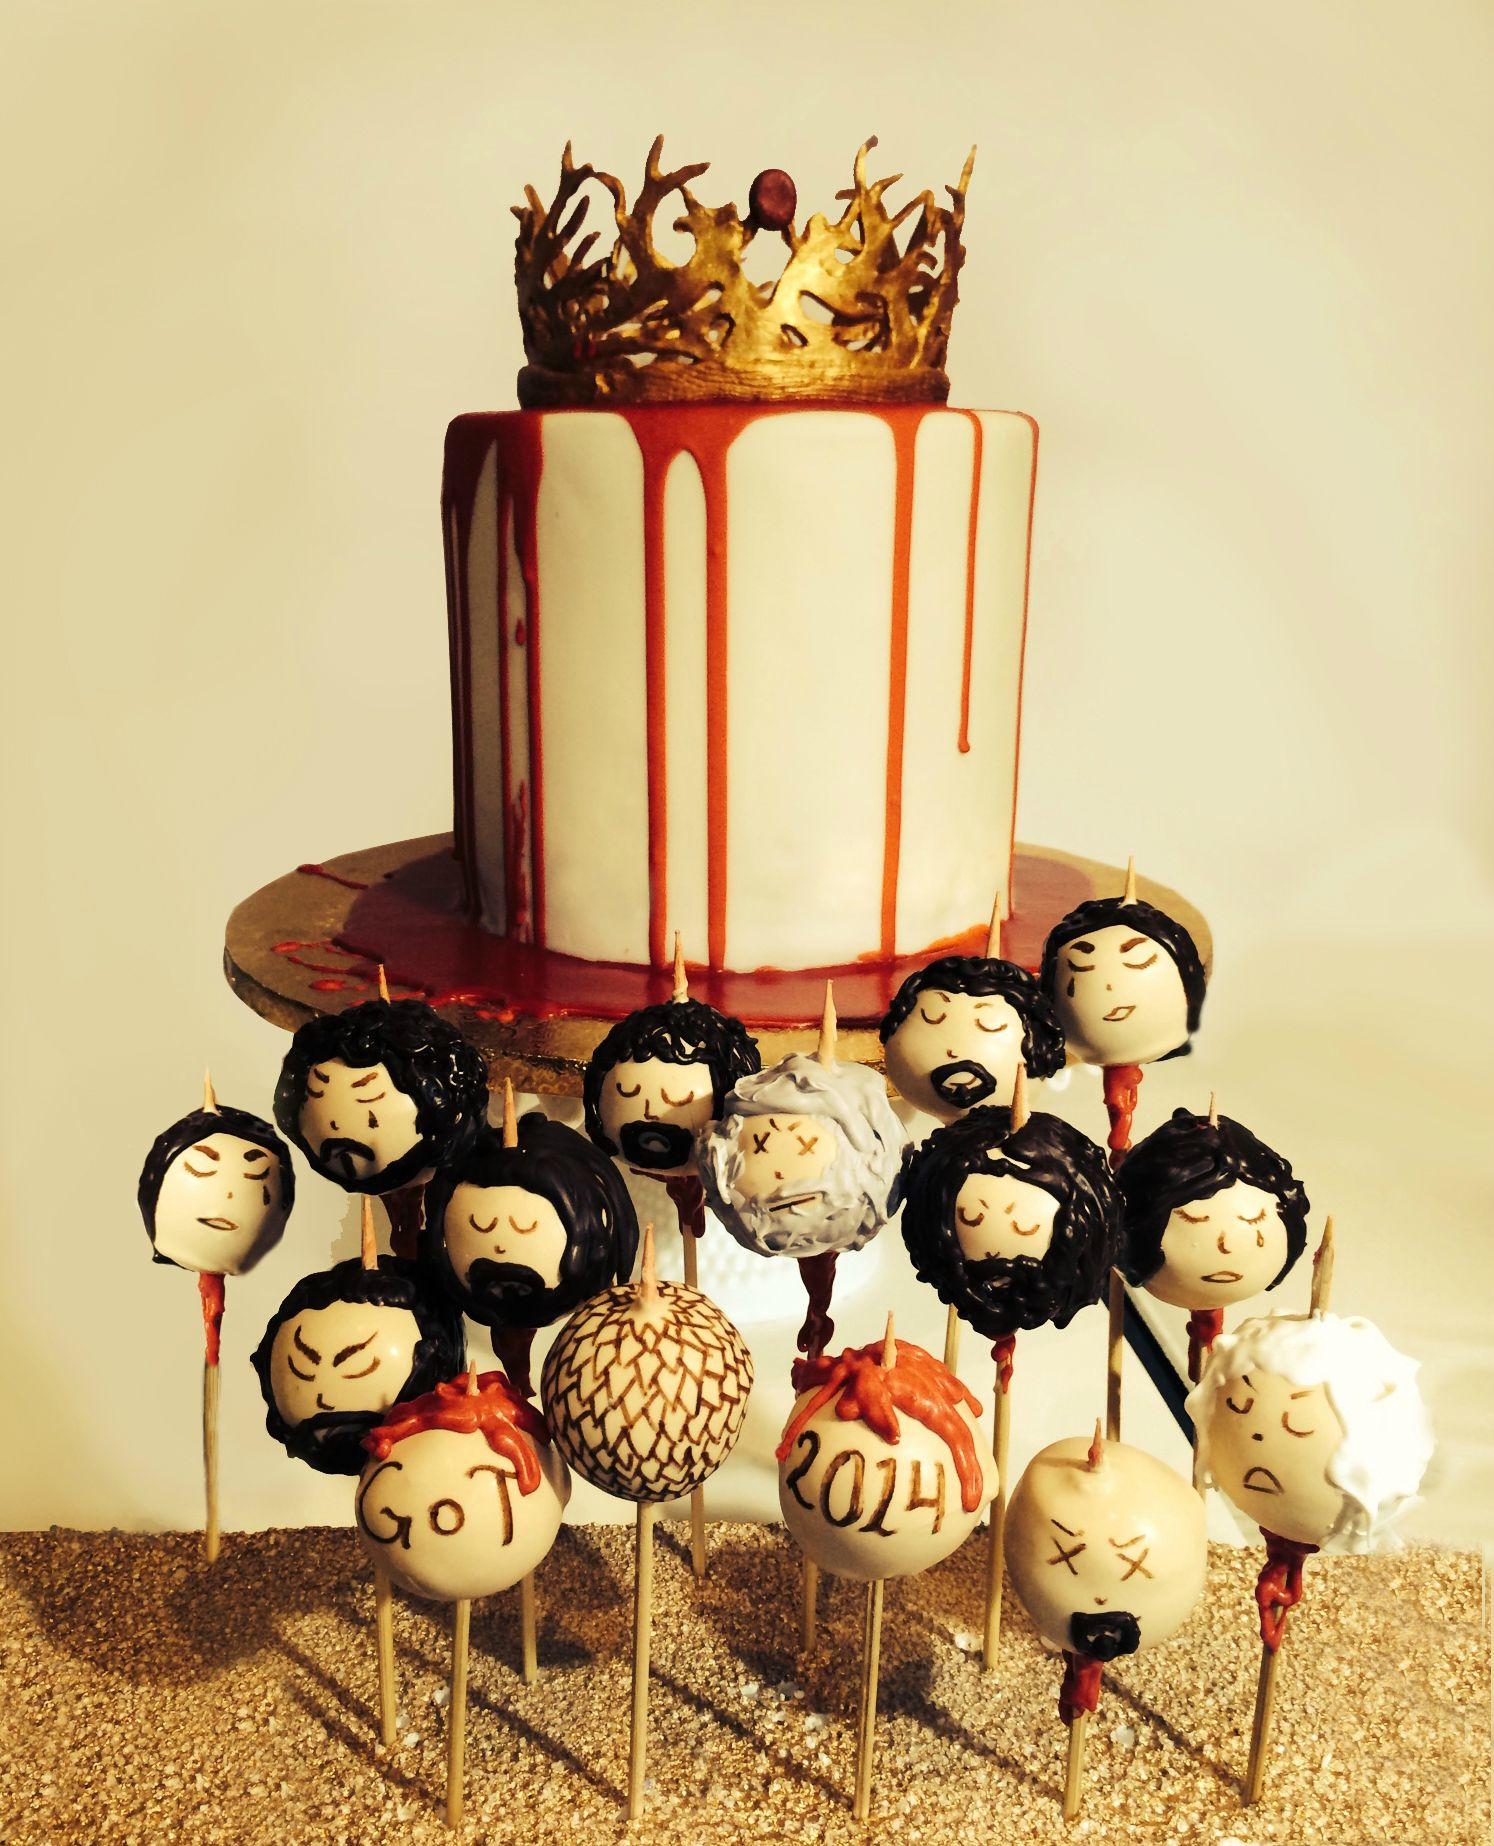 Game Of Thrones Designer Cakes and Cupcakes - Cakes and Cupcakes Mumbai